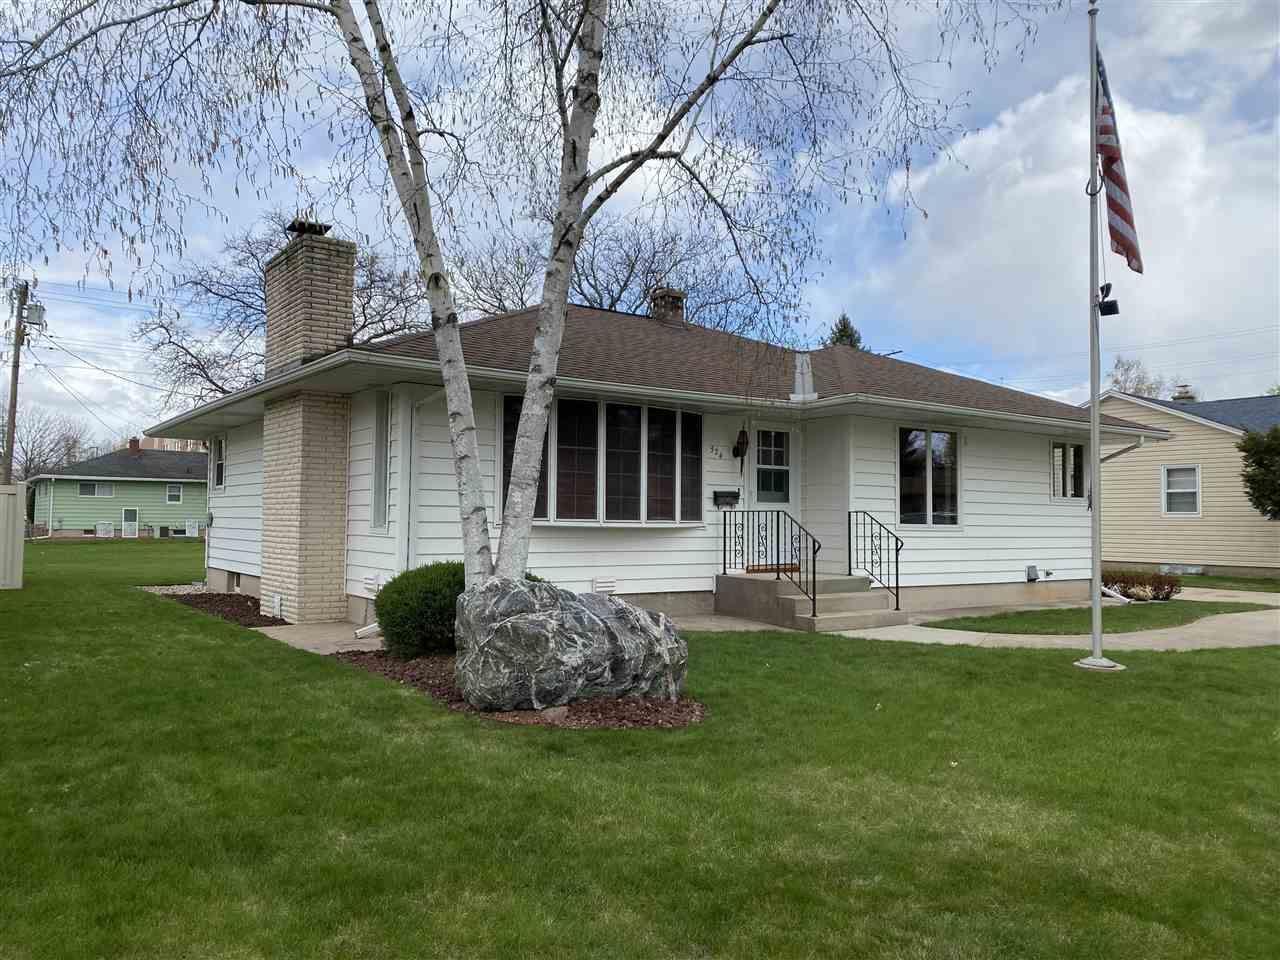 324 Wilcox St, Fort Atkinson, WI 53538 - #: 1907124